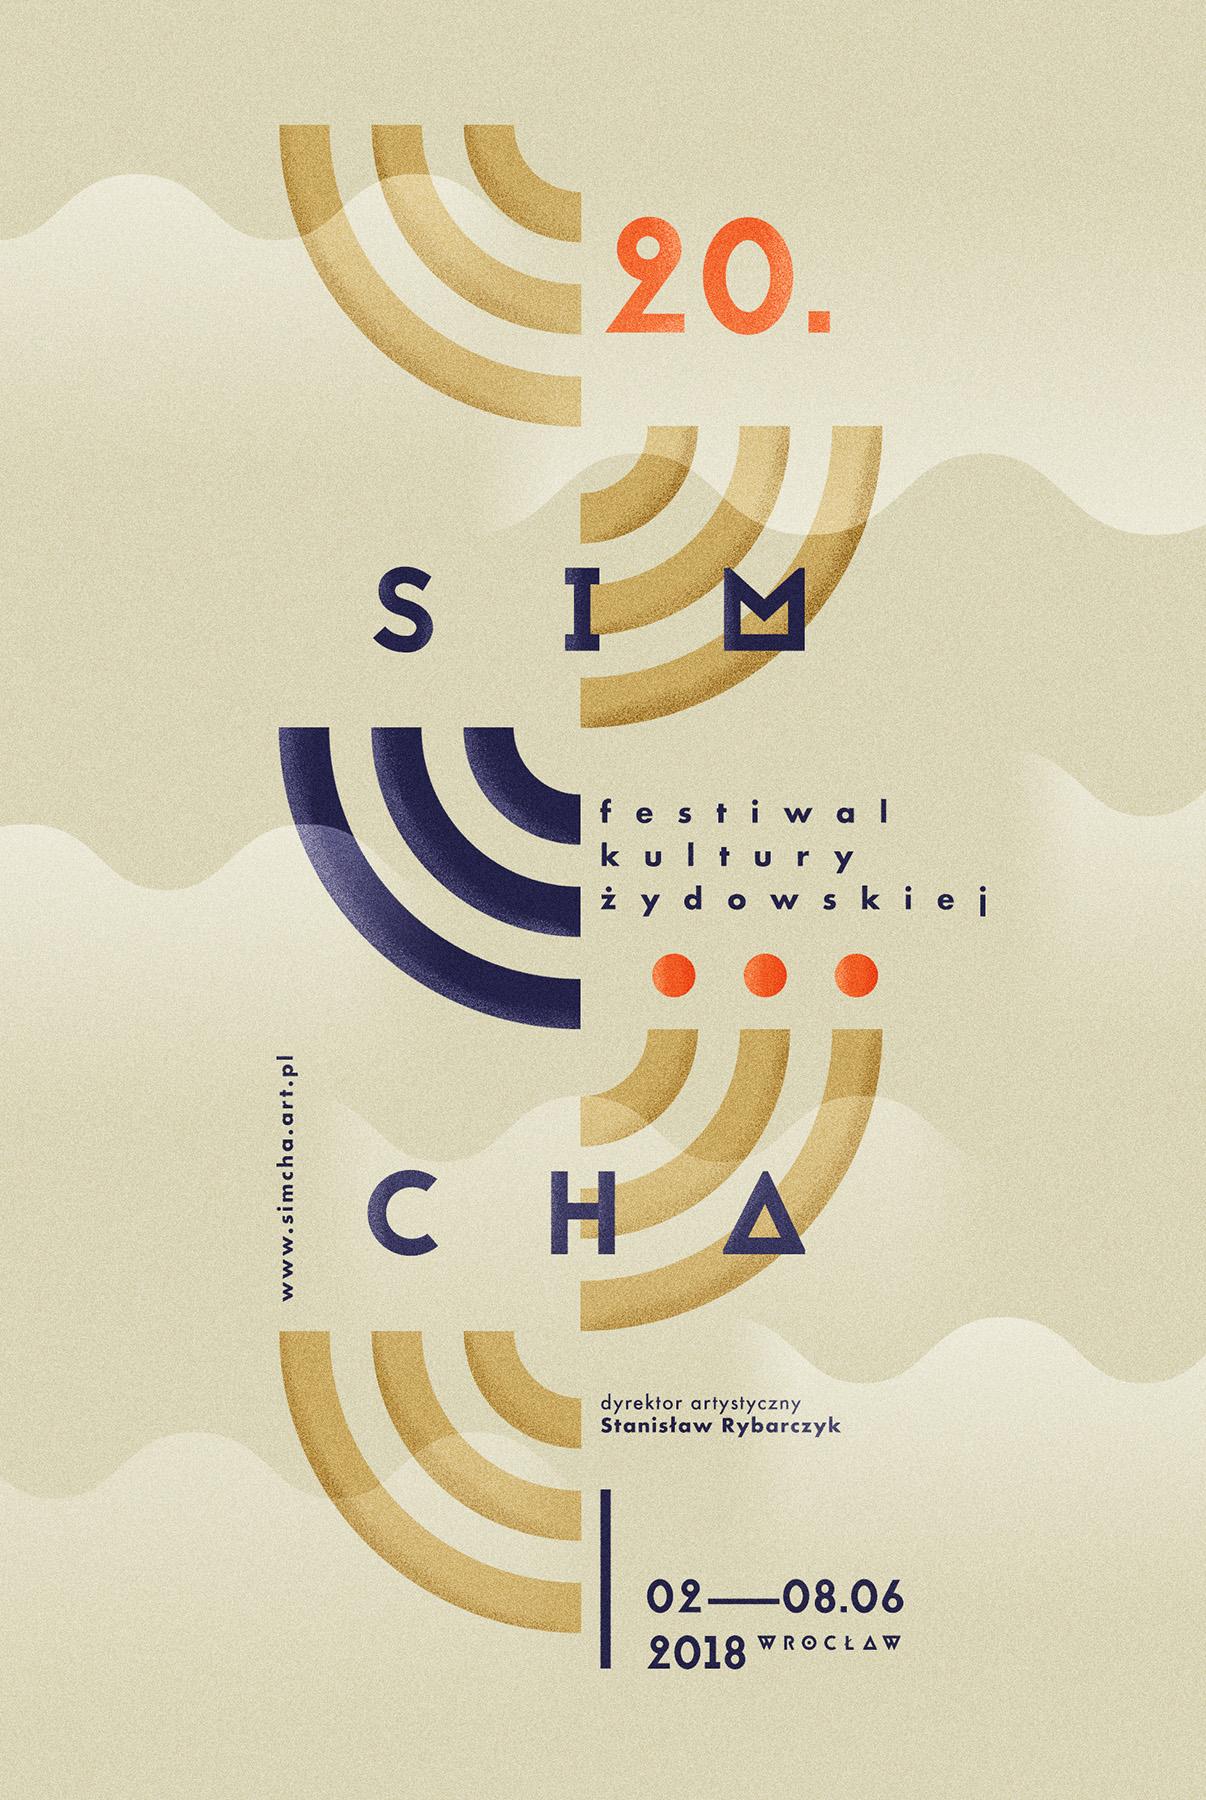 festiwal-kultury-żydowskiej-simcha-2018-program-chidusz